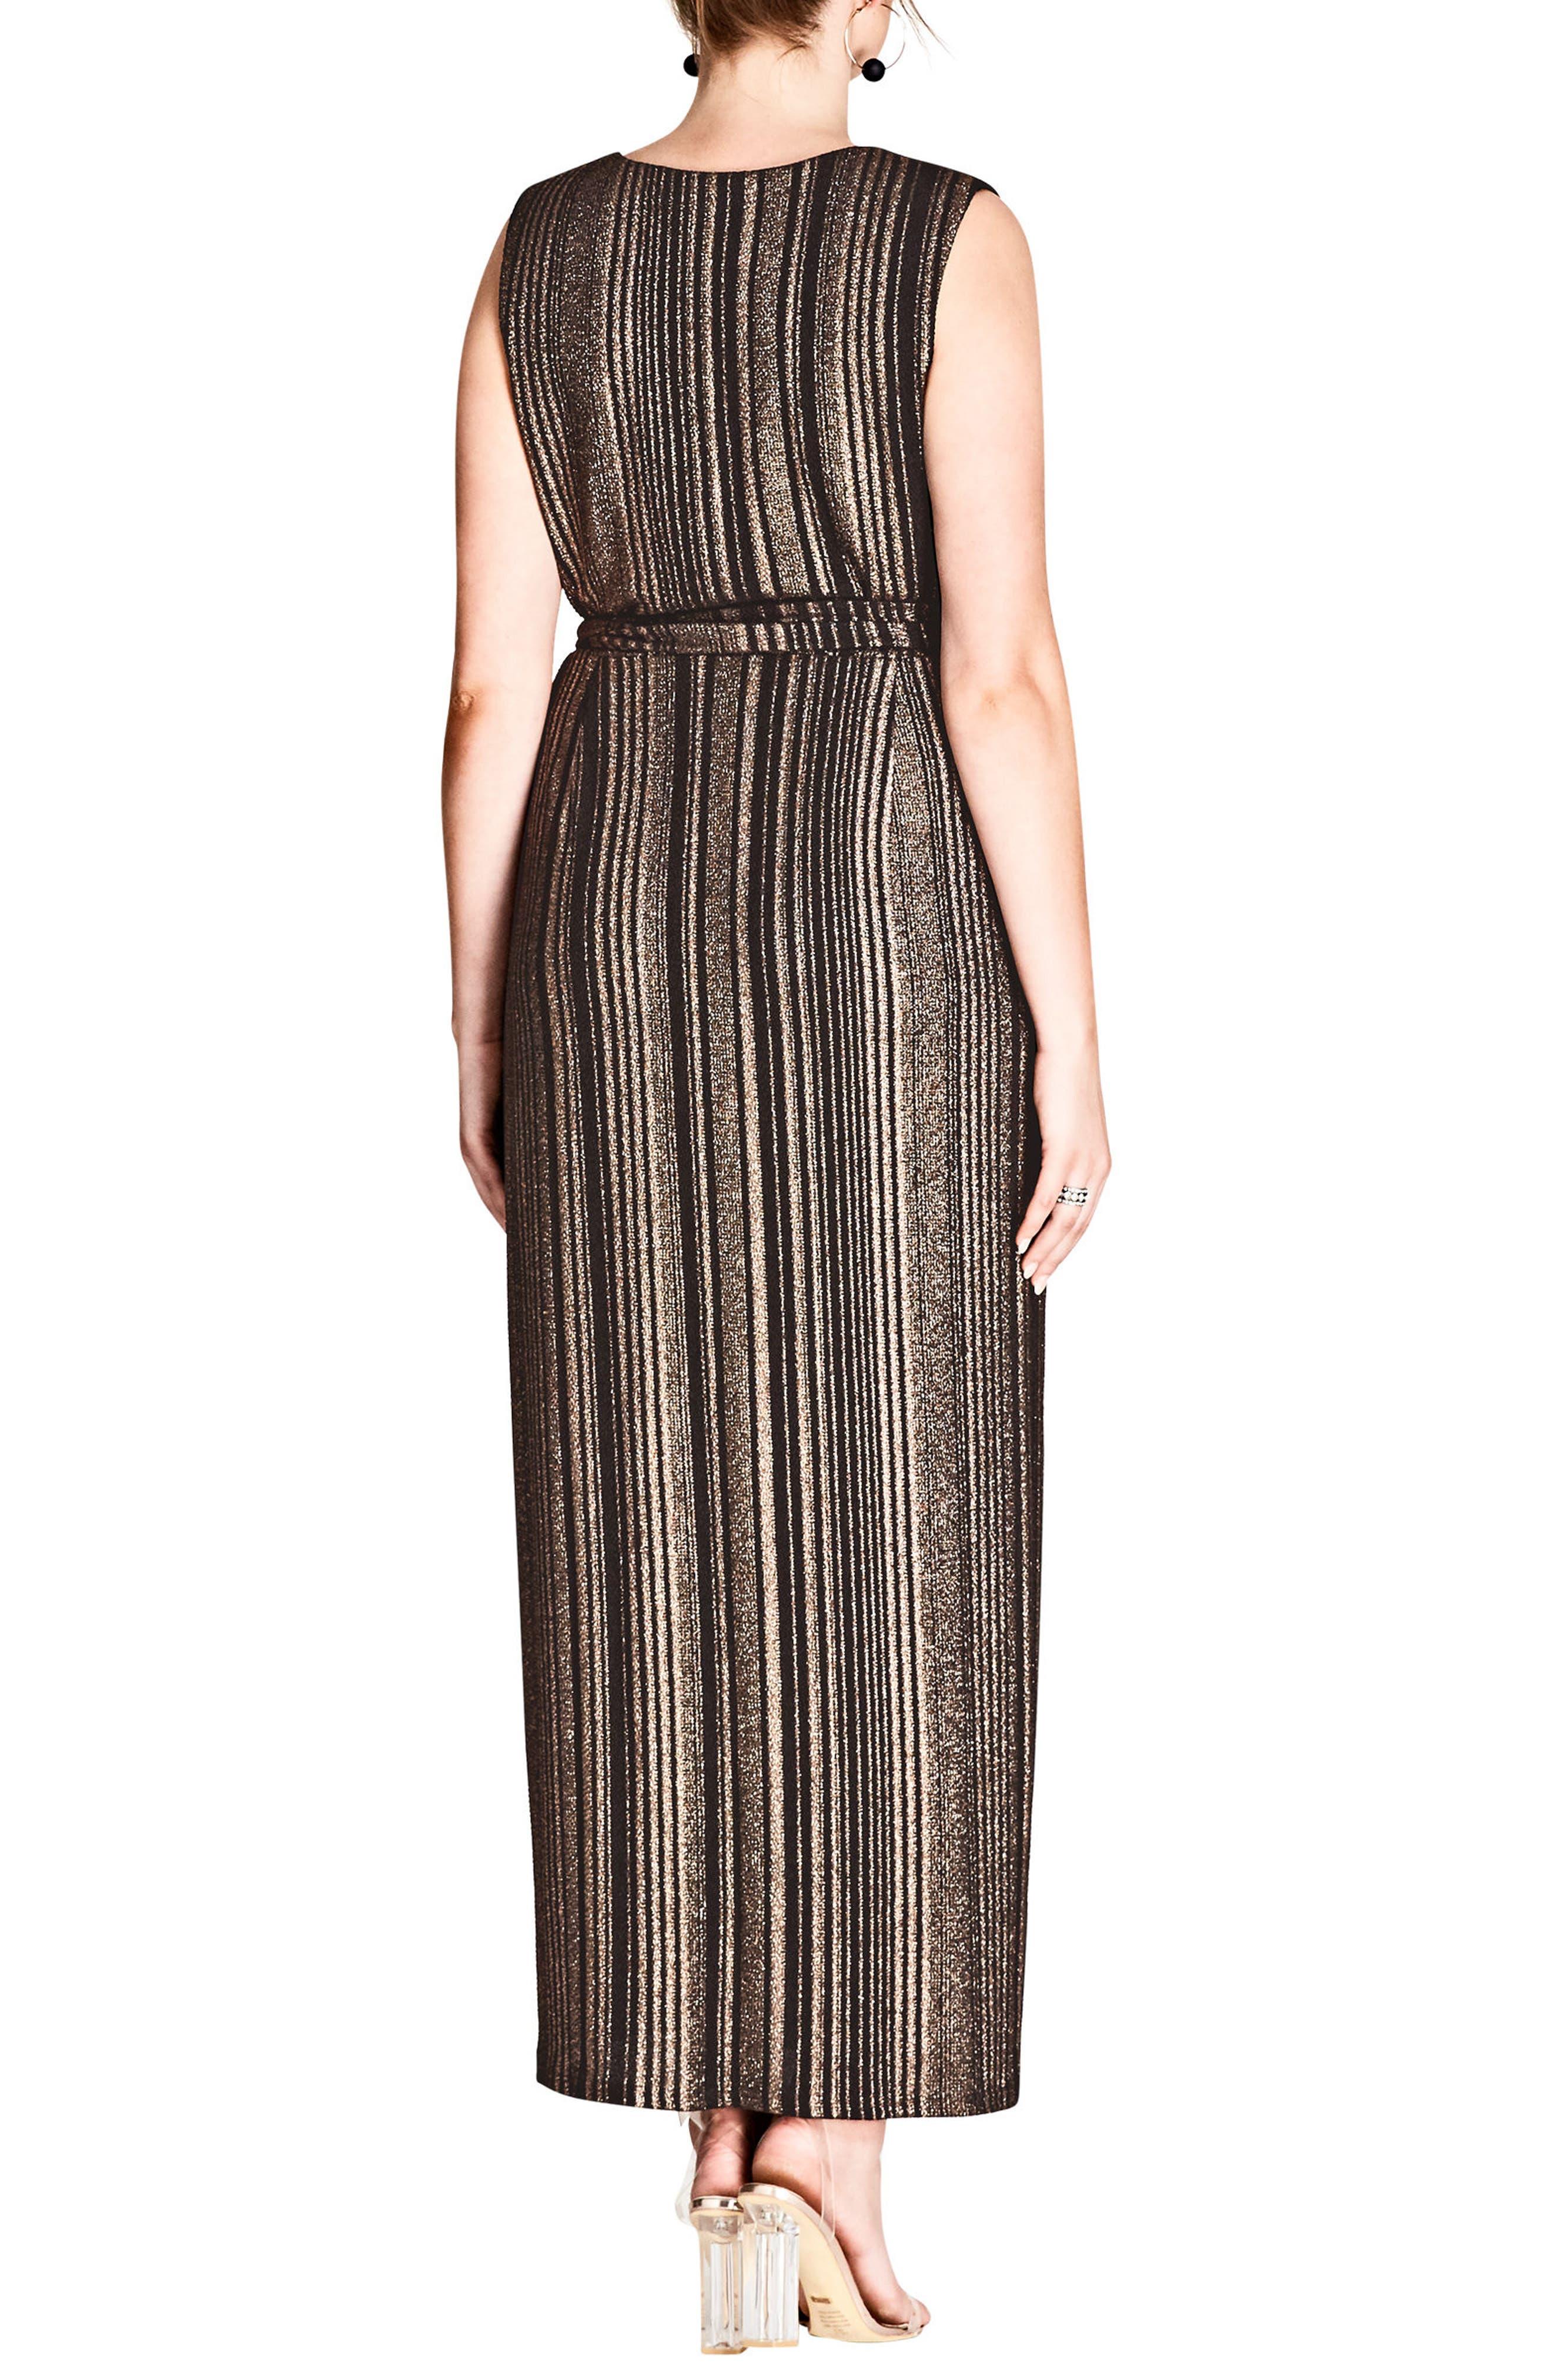 Cleo Wrap Maxi Dress,                             Alternate thumbnail 2, color,                             Black